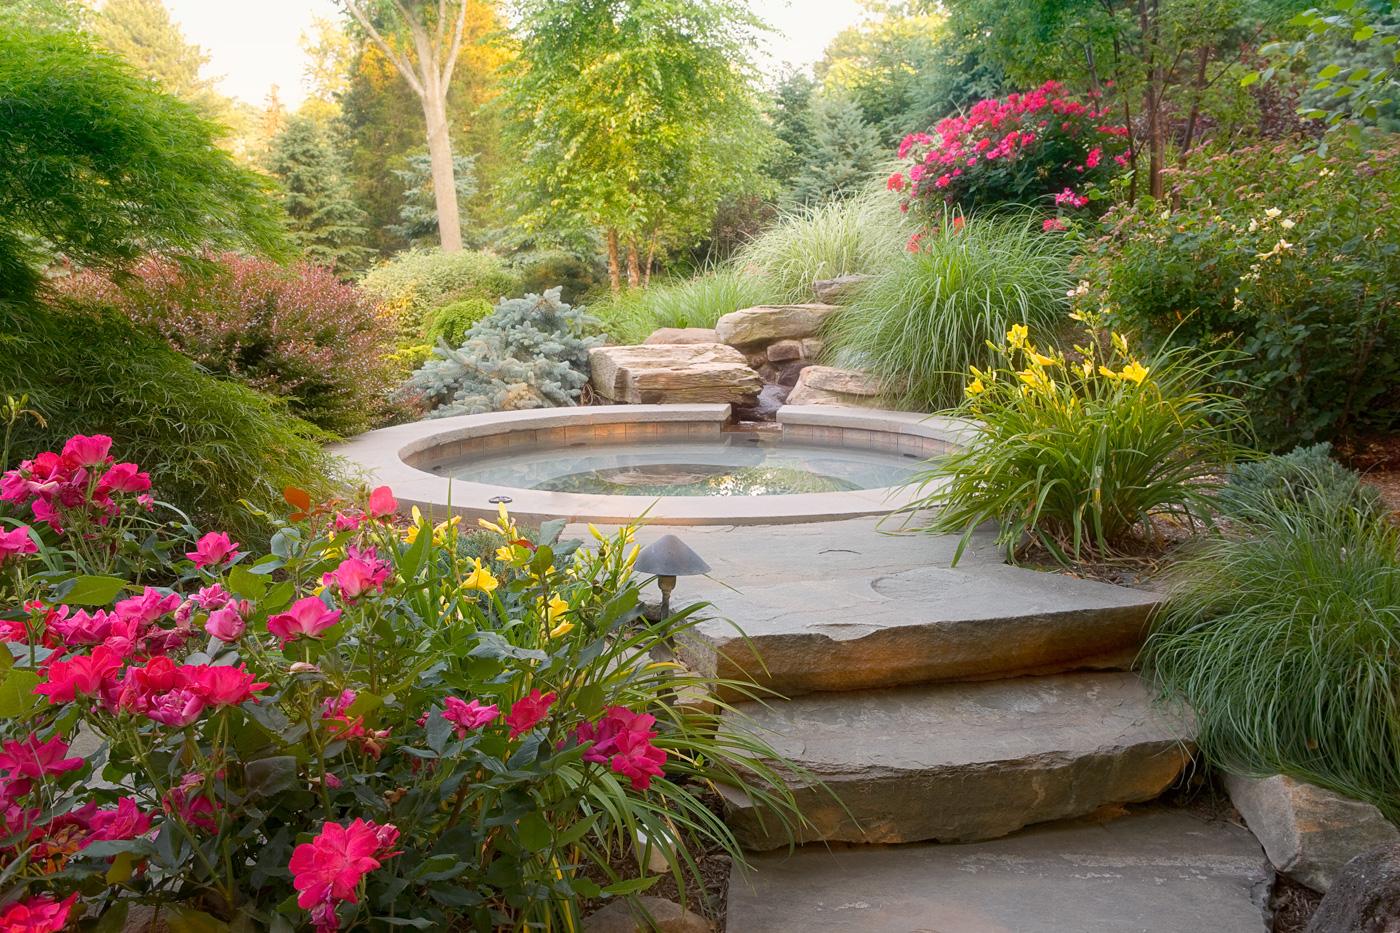 garden design trends 2014 - Garden Design Trends 2014